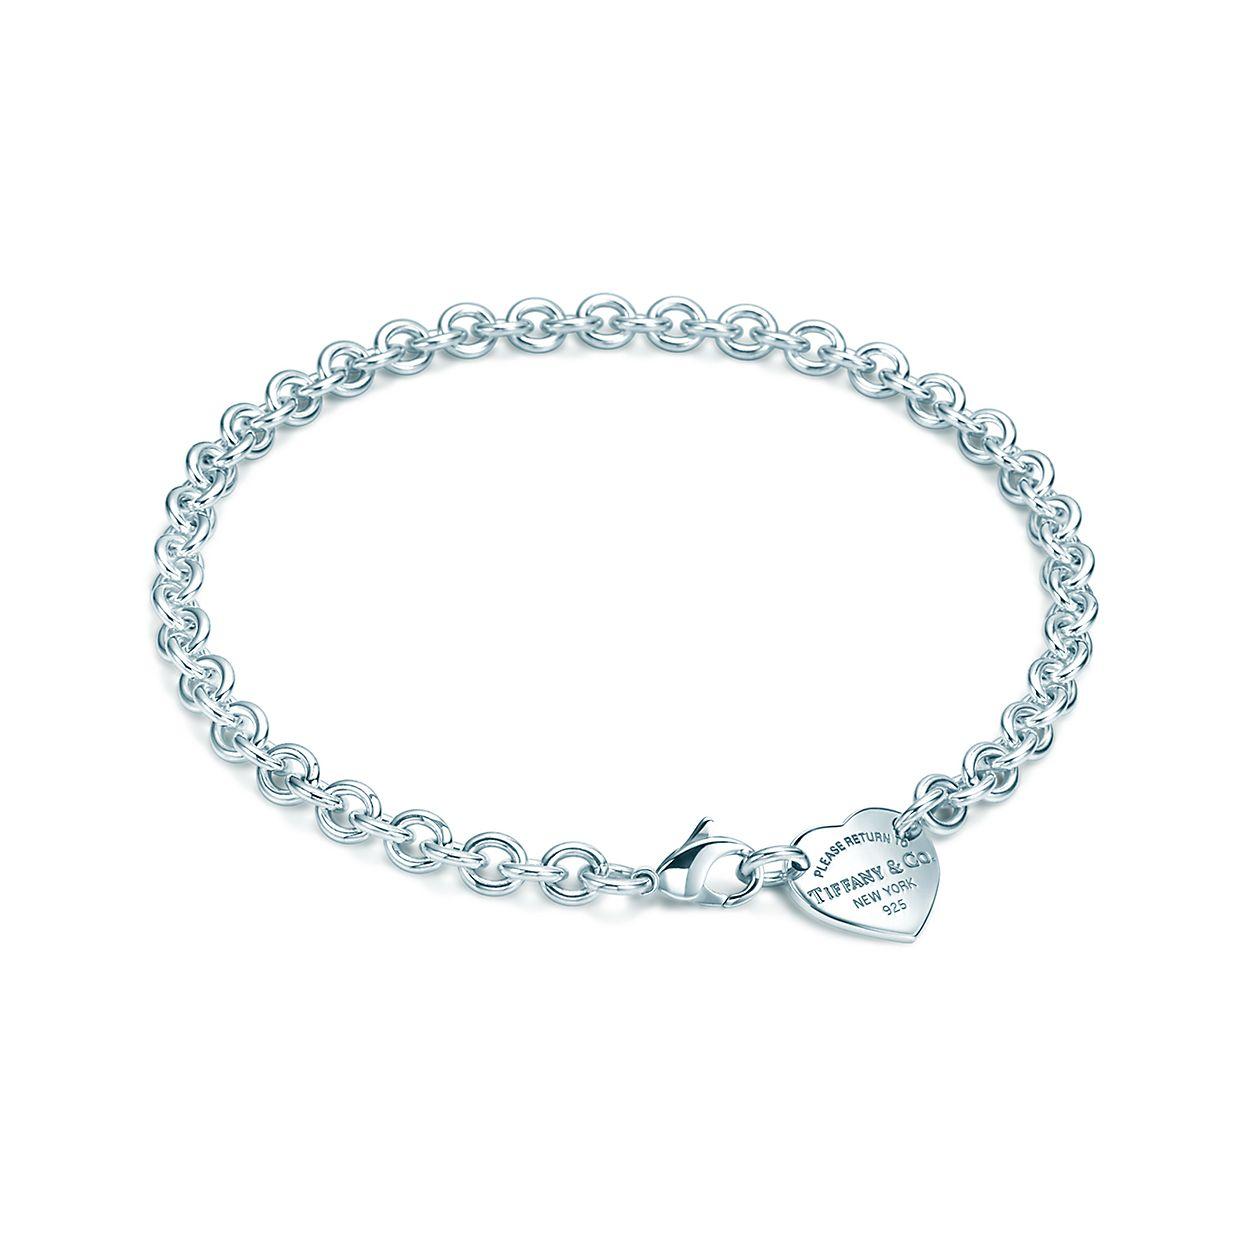 219a3e60c Return to Tiffany® heart tag choker in sterling silver. | Tiffany & Co.